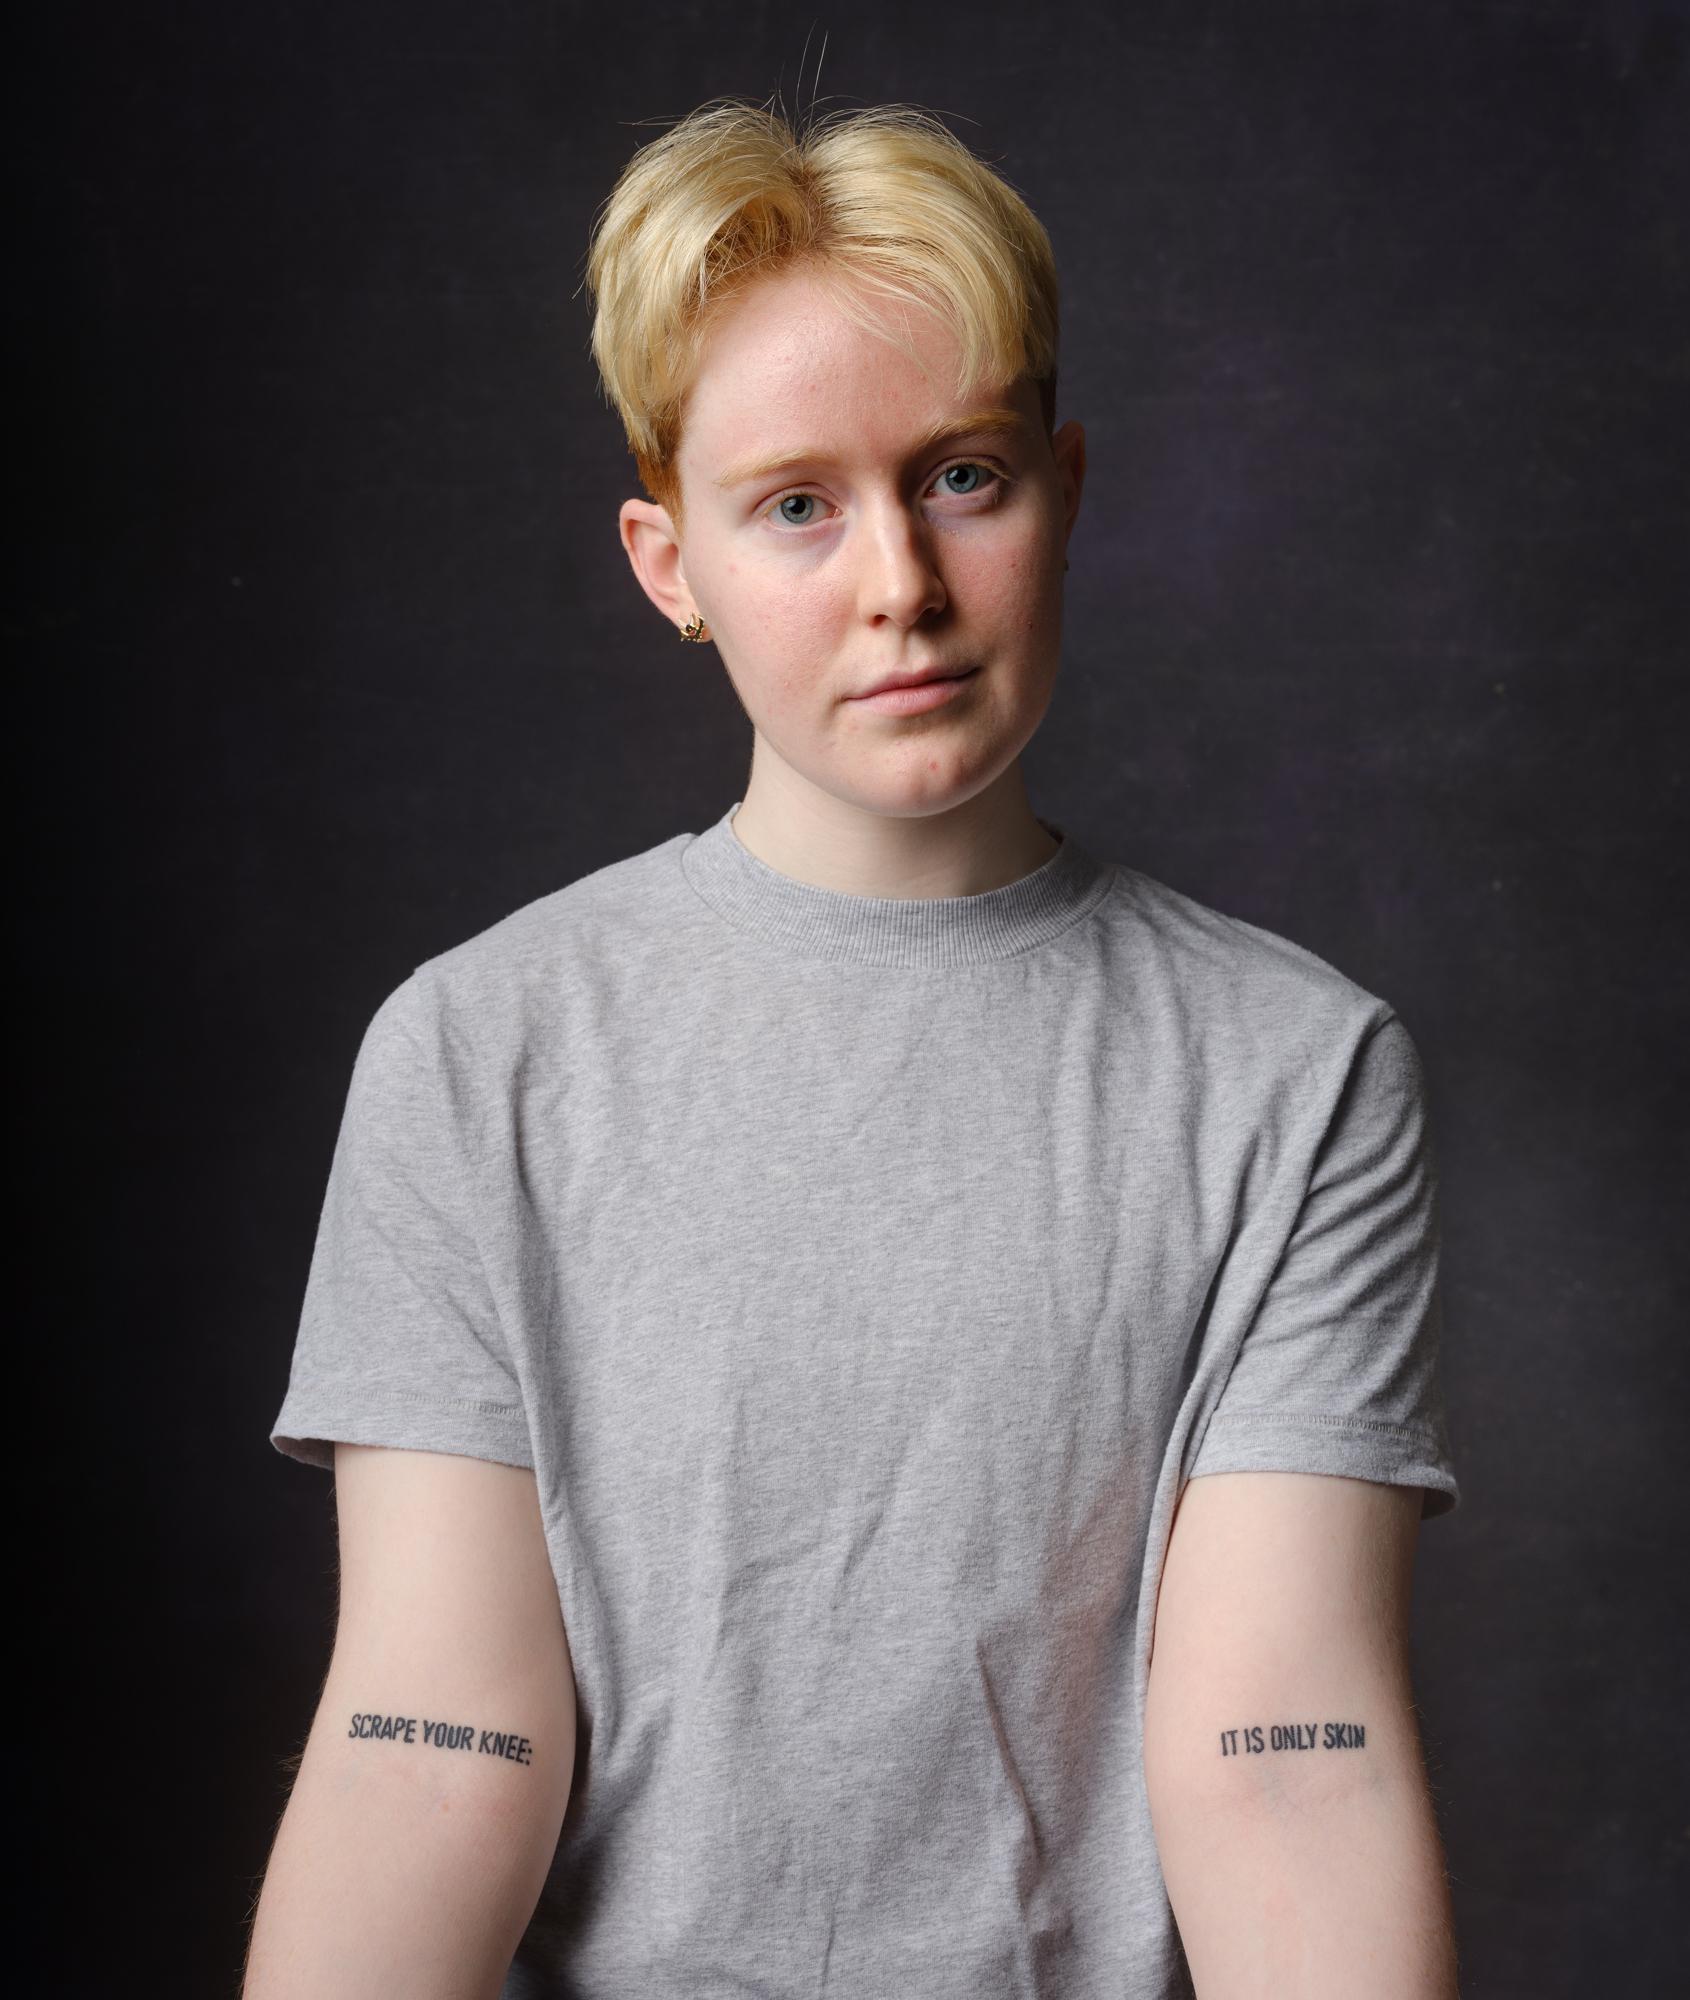 Trans Rights activist Eidin Moyne